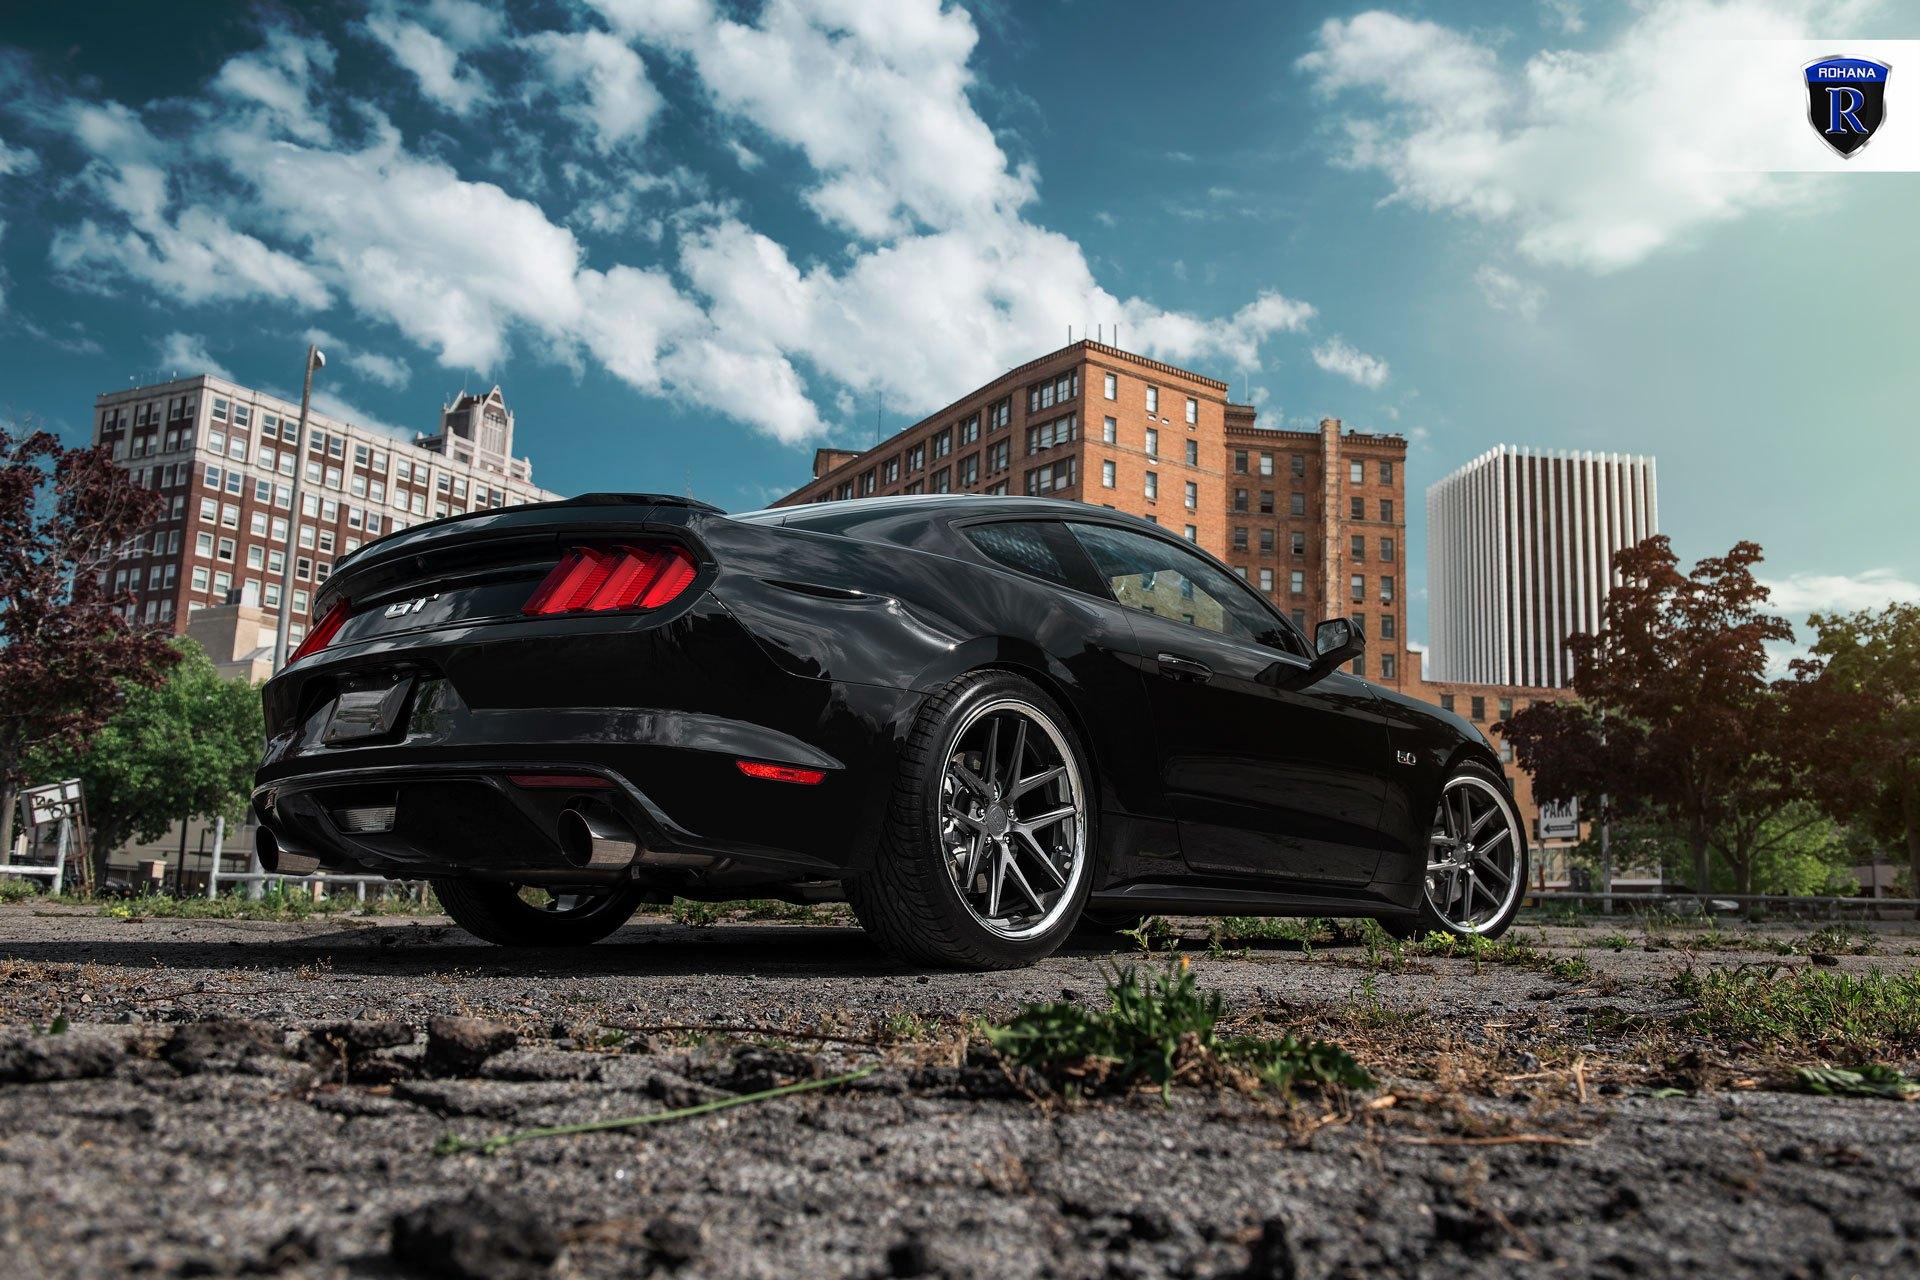 2015 Mustang Custom Wheels >> Rohana Rc9 Custom Wheels On A Black Ford Mustang Gt Carid